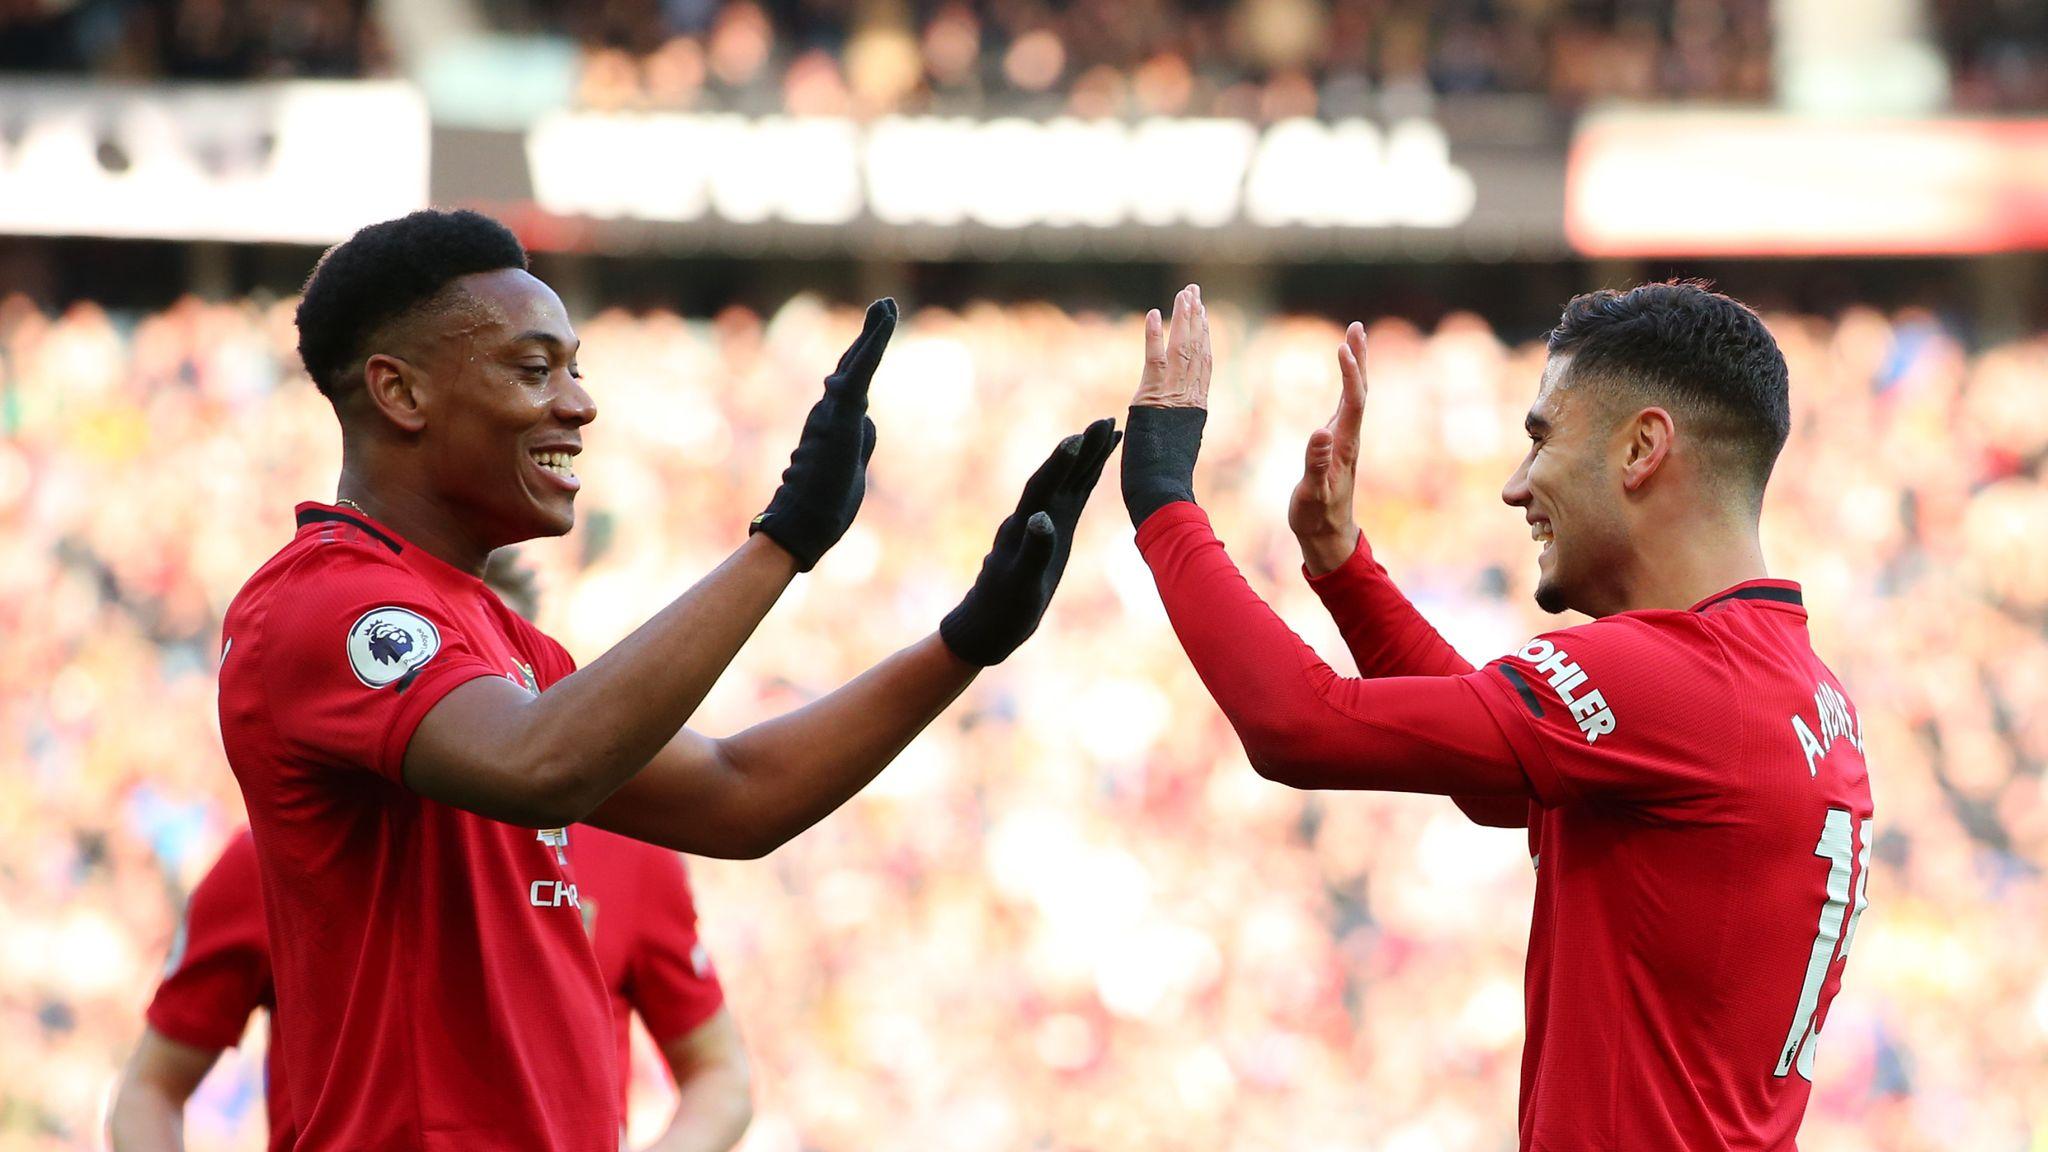 Man Utd's flying forwards bringing fun back to Old Trafford